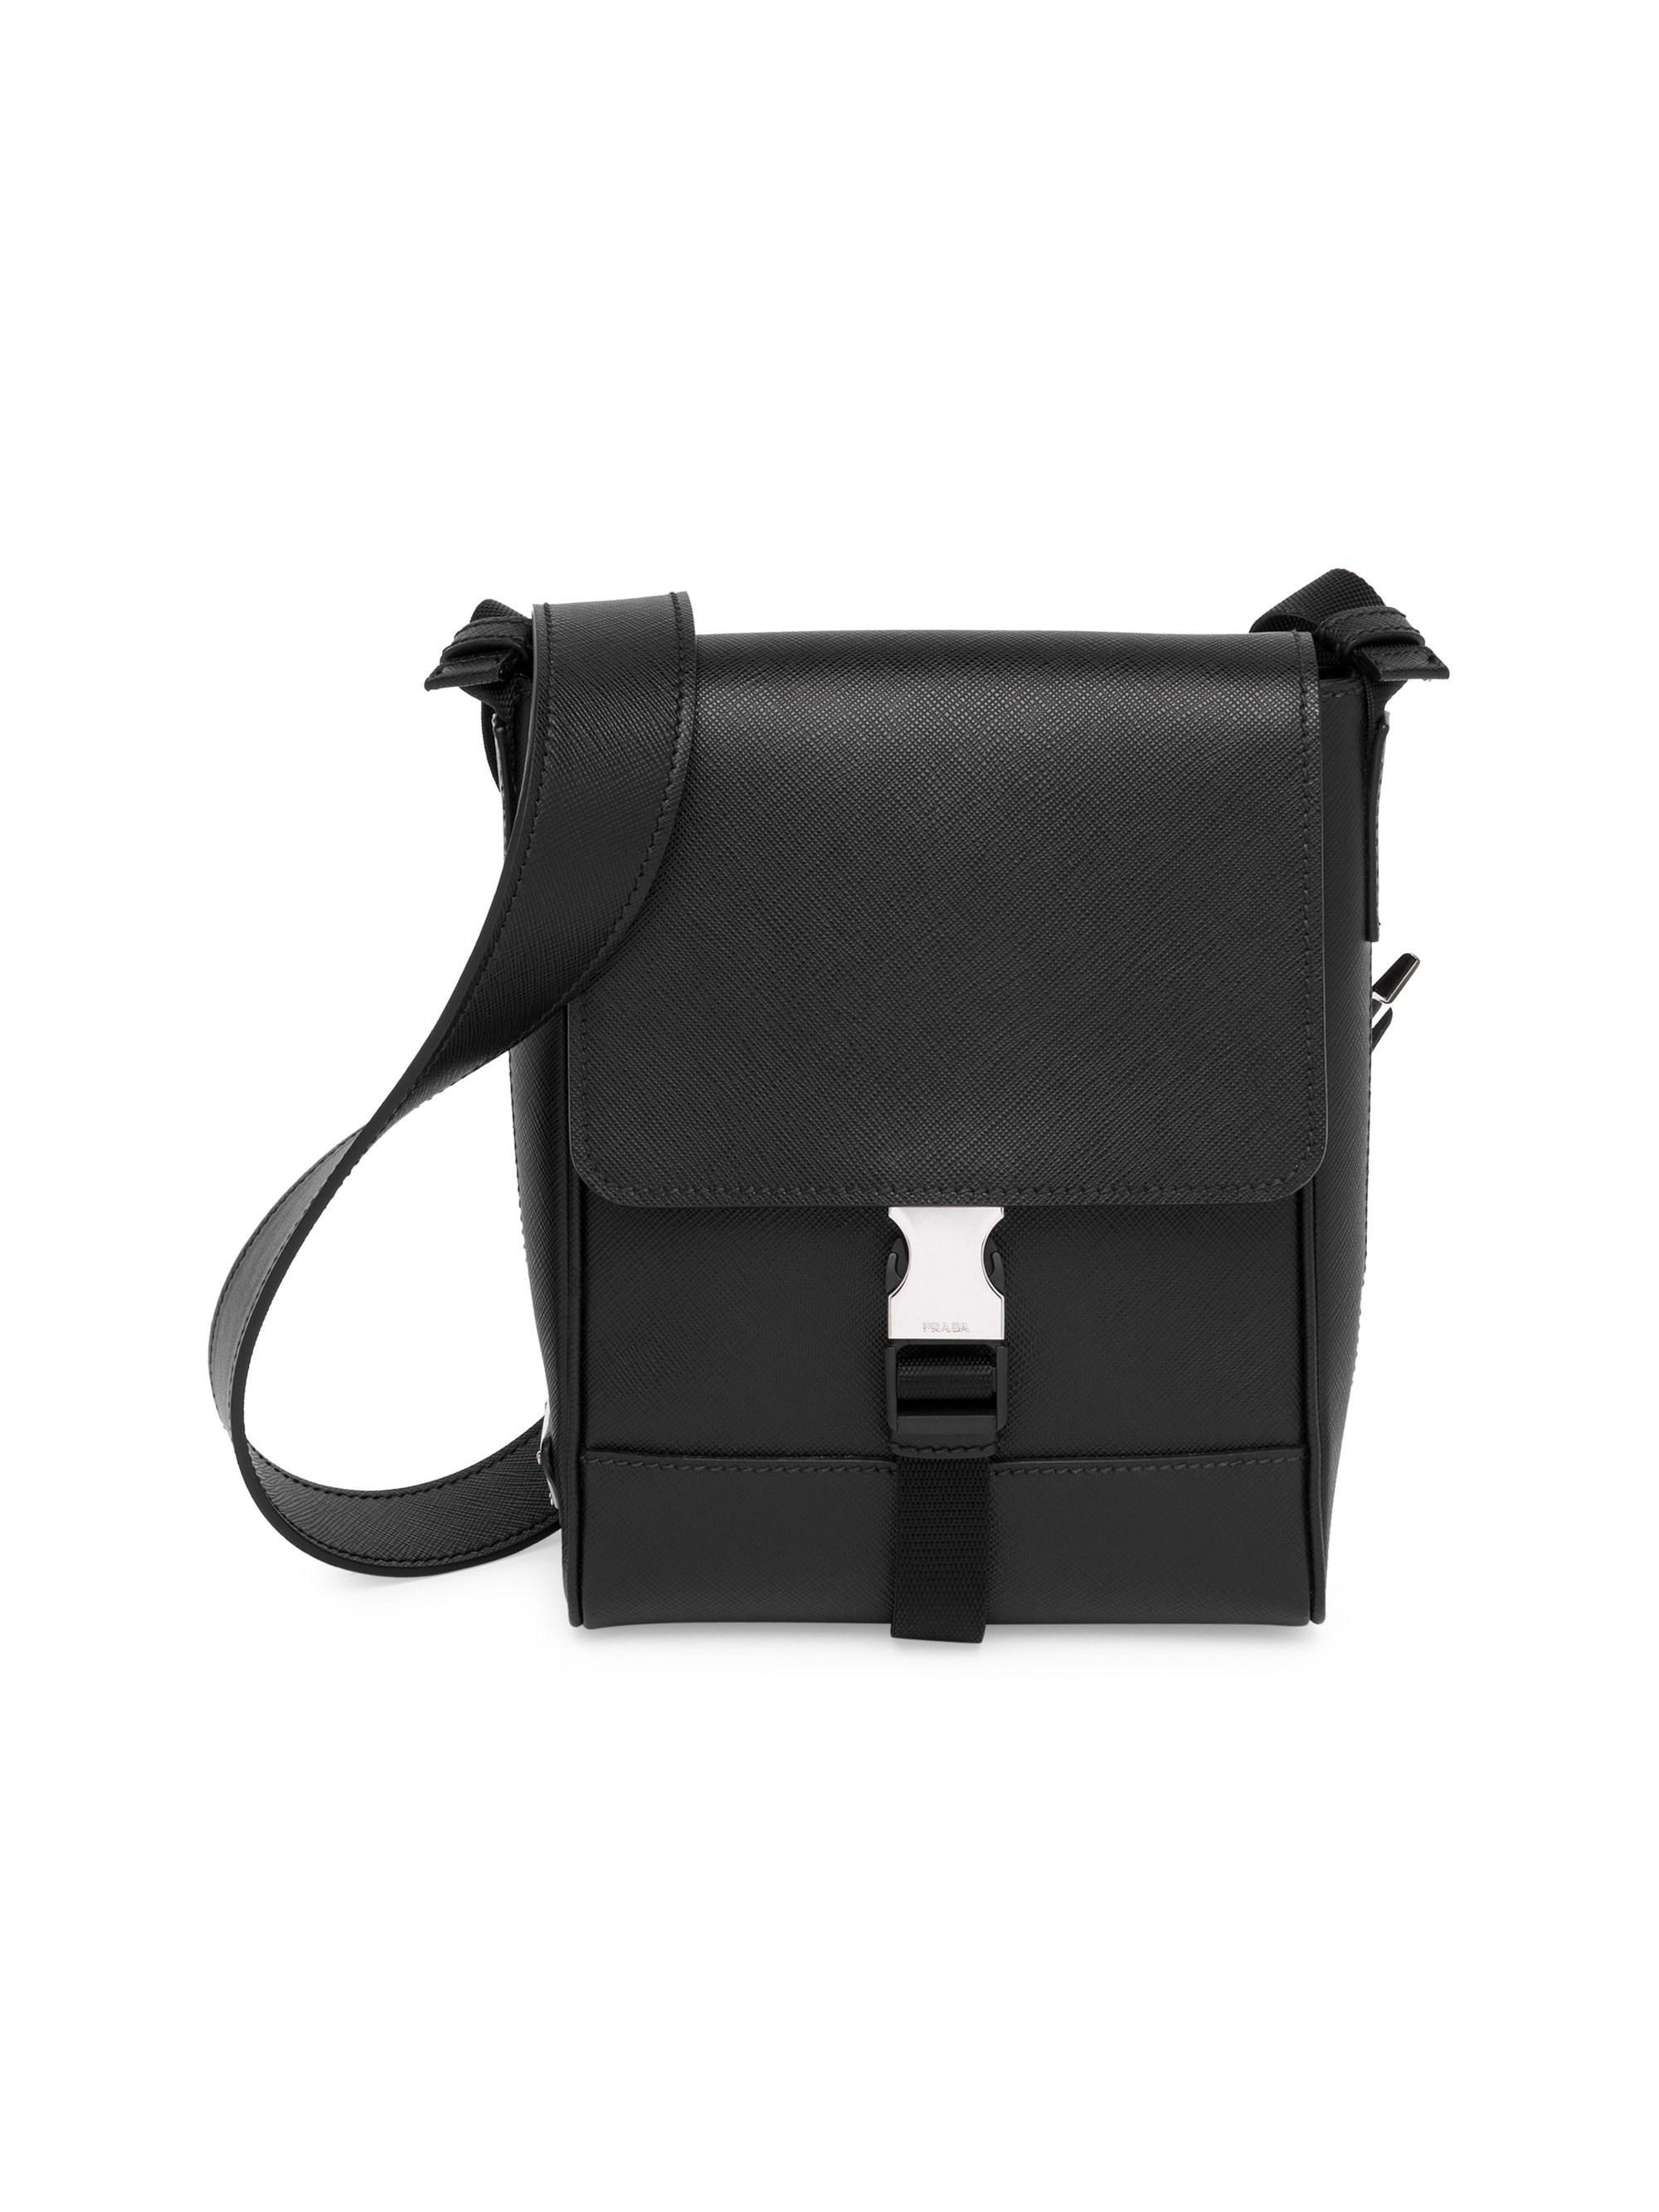 Lyst - Prada Men s Saffiano Leather Travel Crossbody Bag - Black in ... 3391e89425eaf